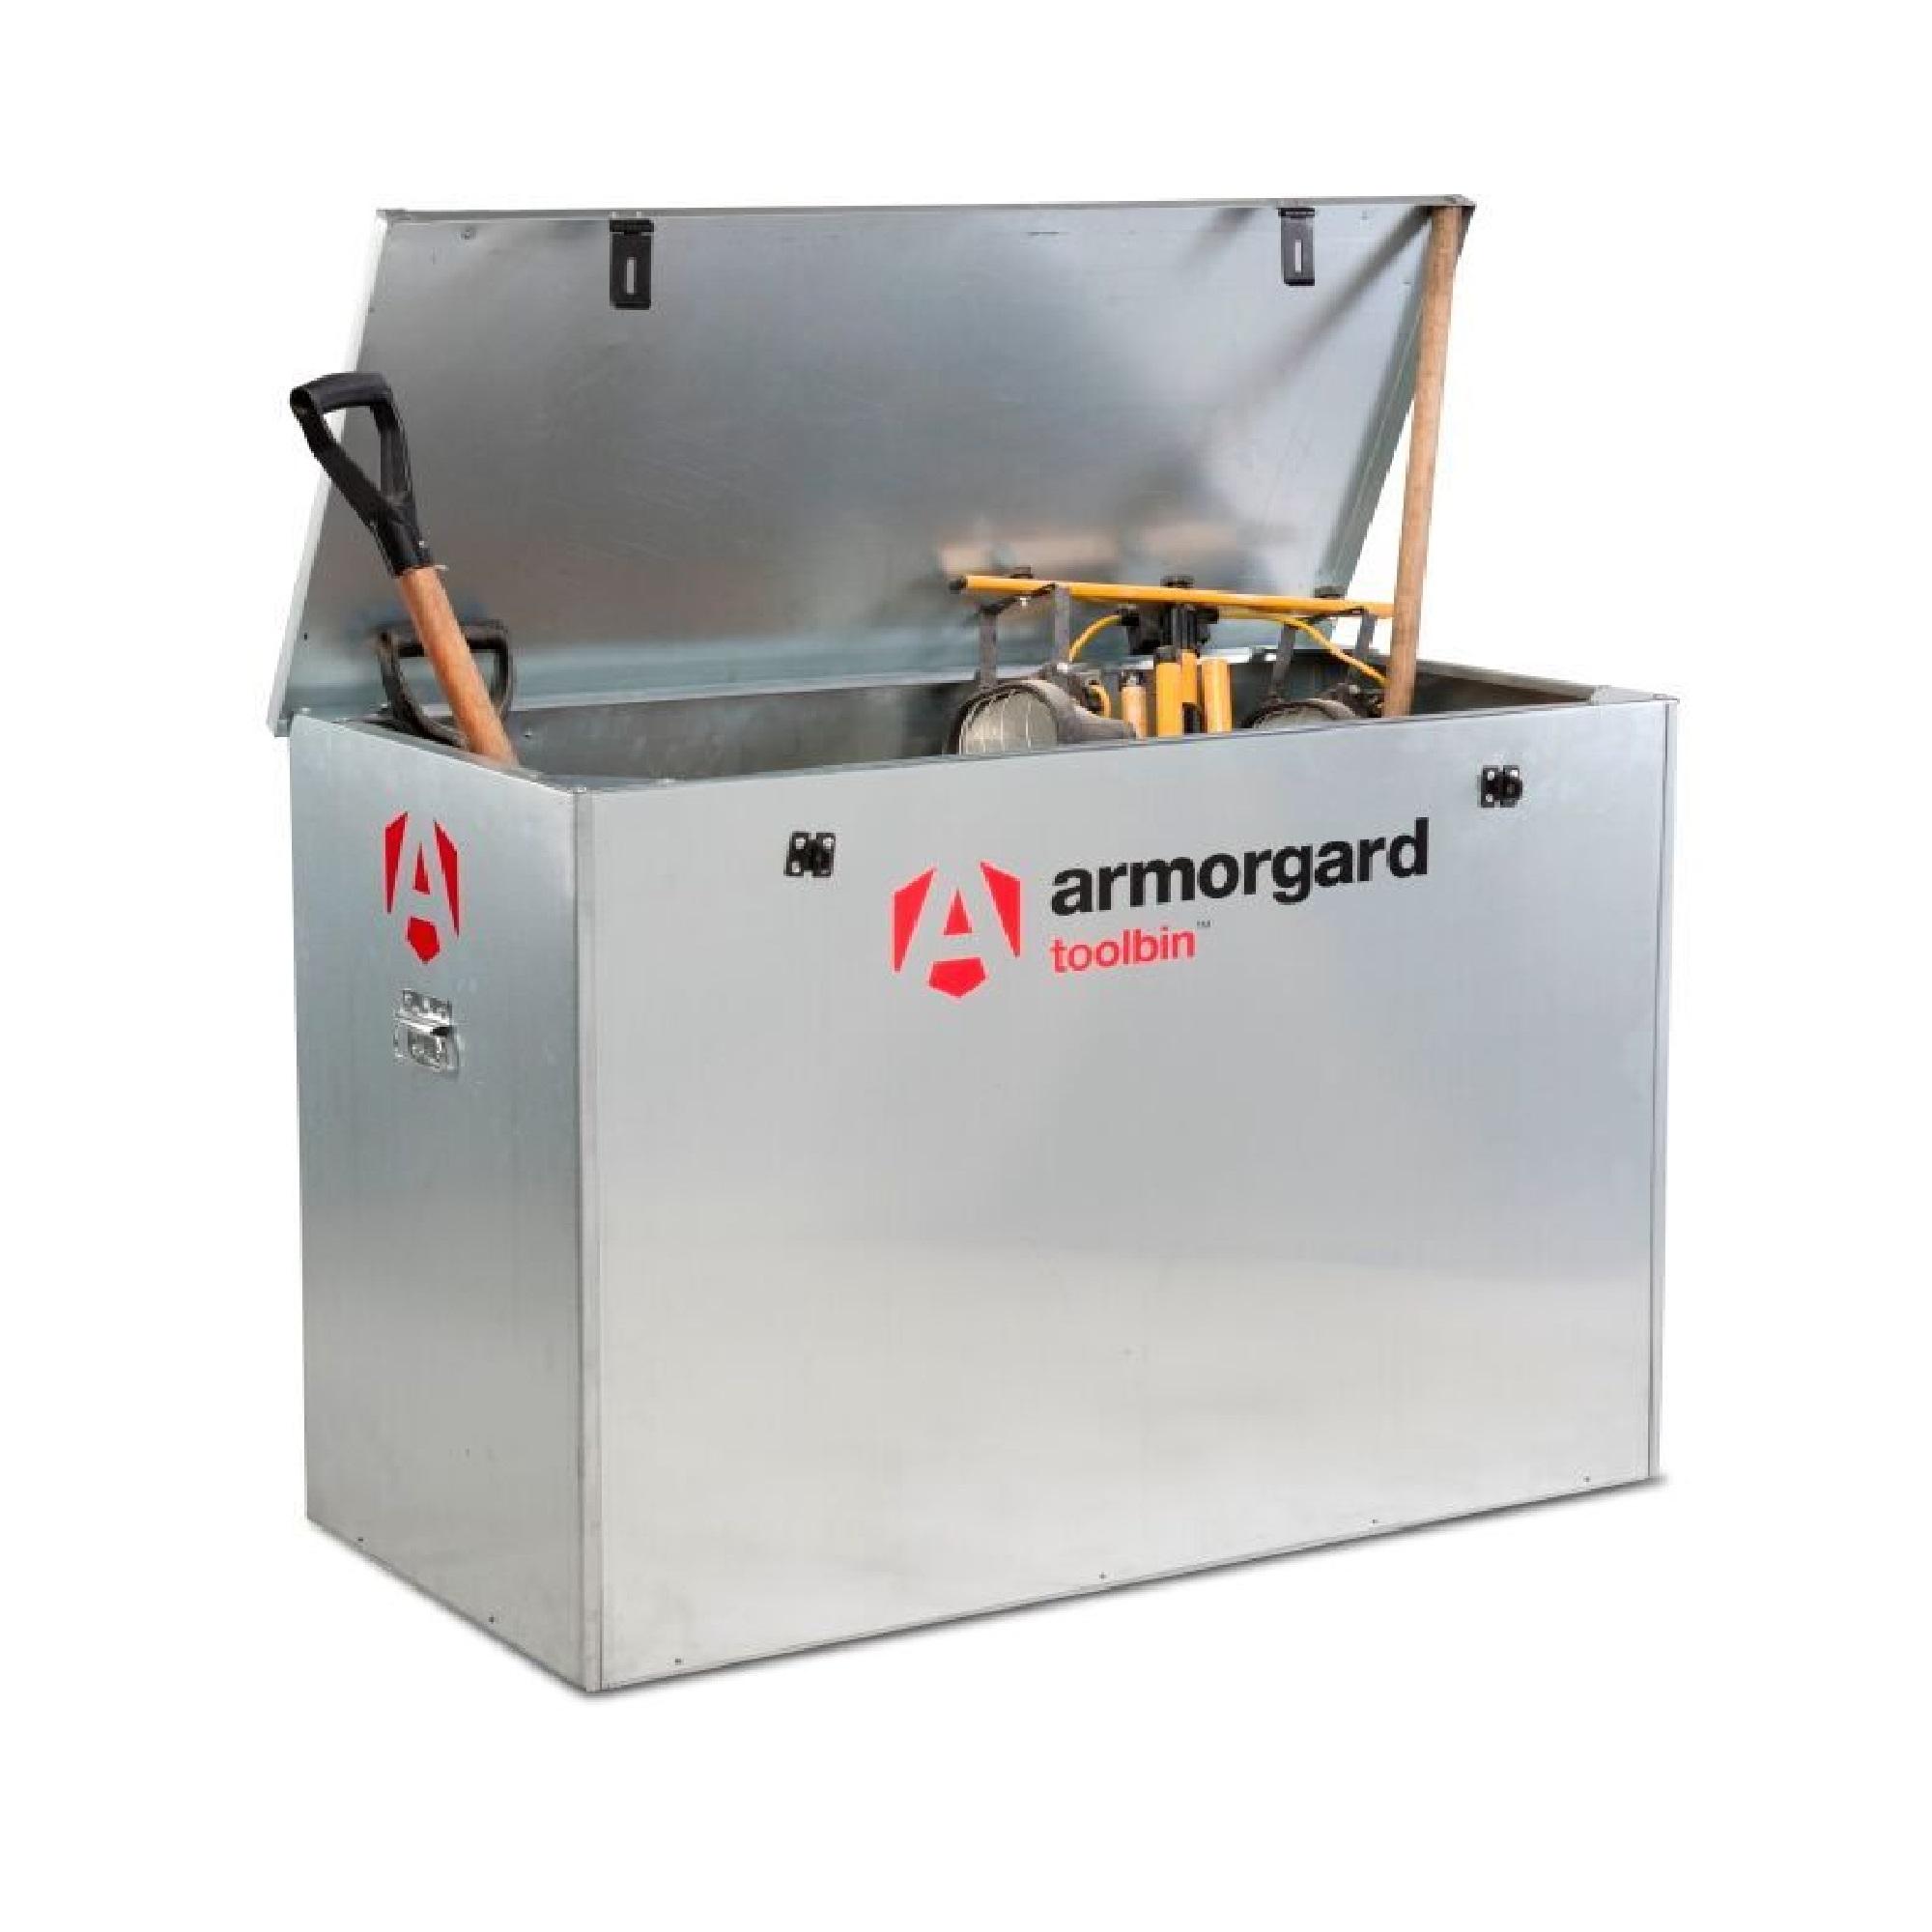 Armorgard Toolbin GB3